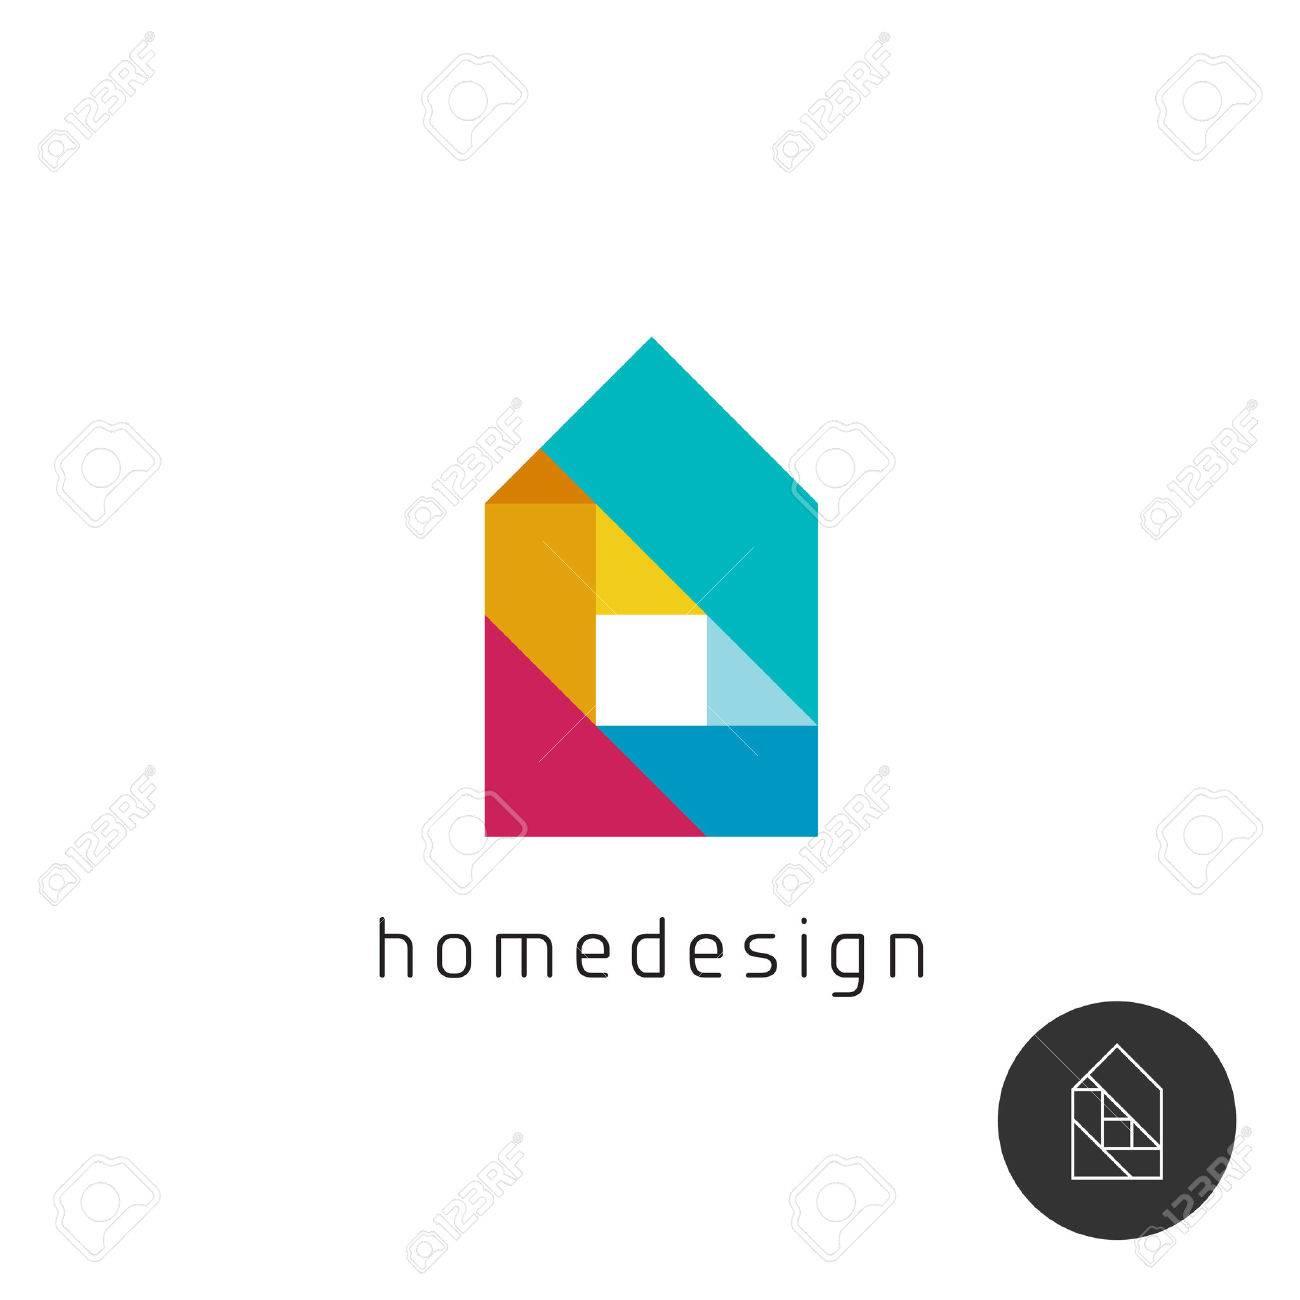 house design concept colorful rainbow geometric elements royalty house design concept colorful rainbow geometric elements stock vector 49334946